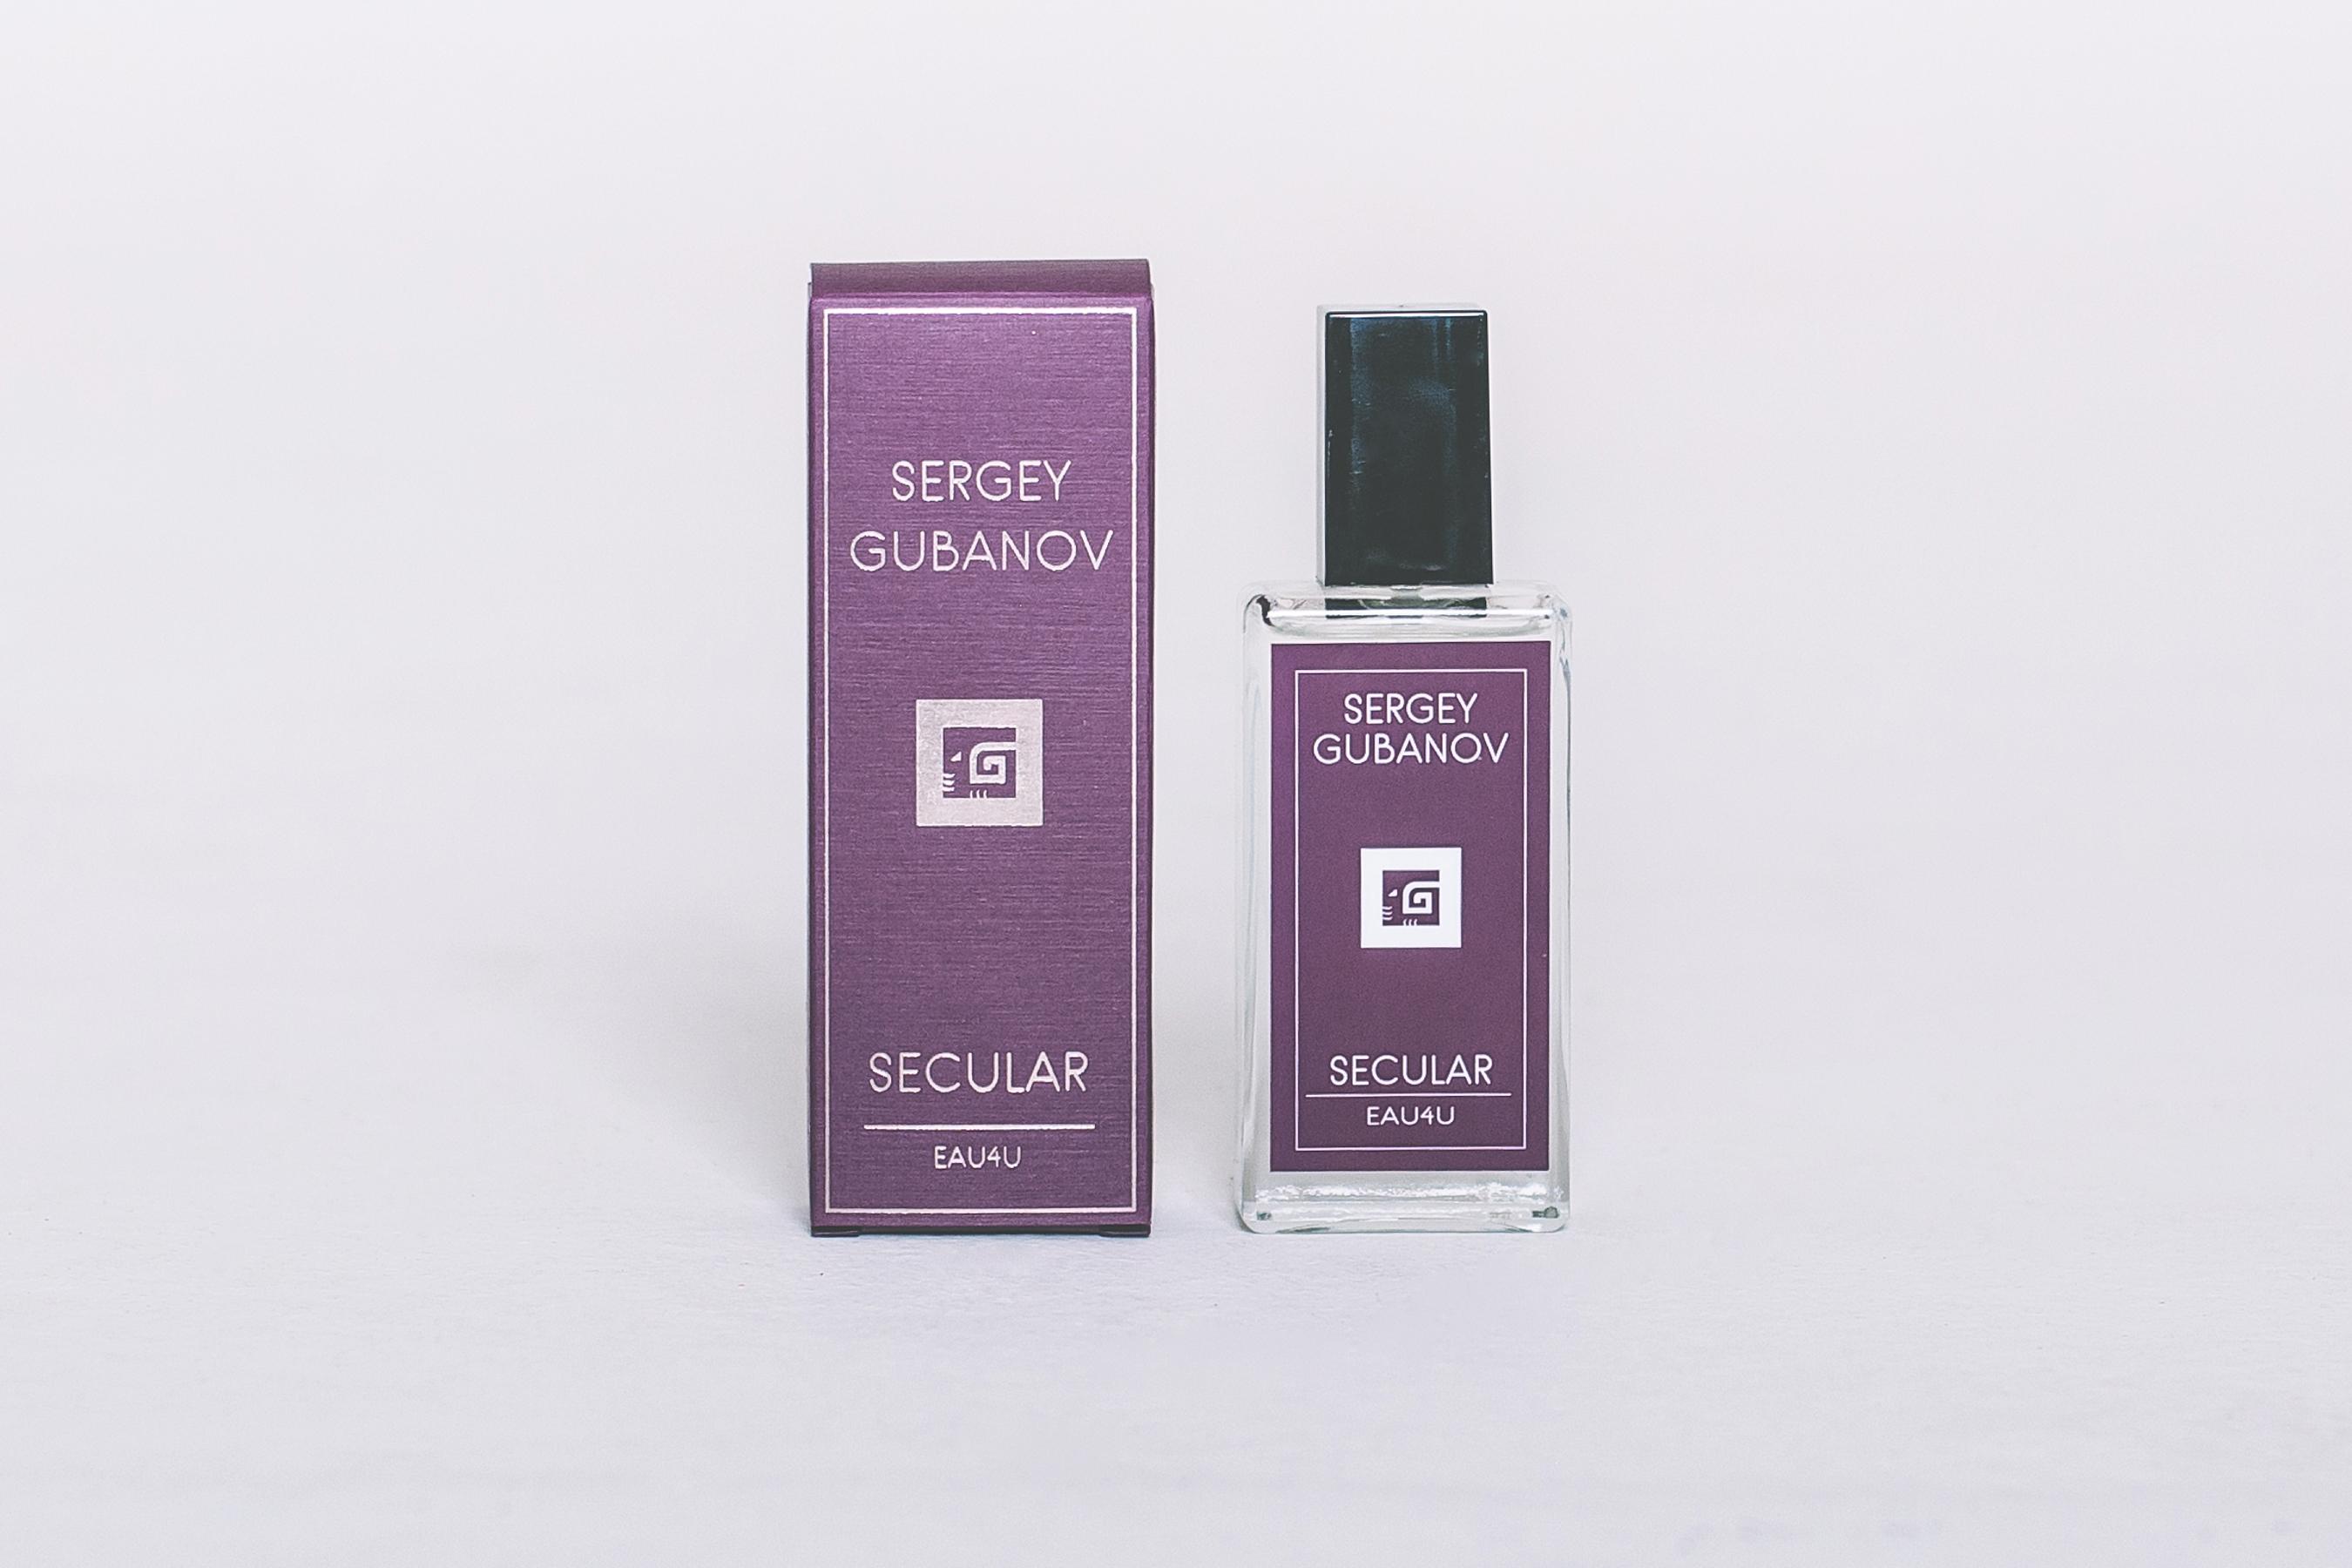 «Вода для тебя» Secular, Sergey Gubanov EAU4U